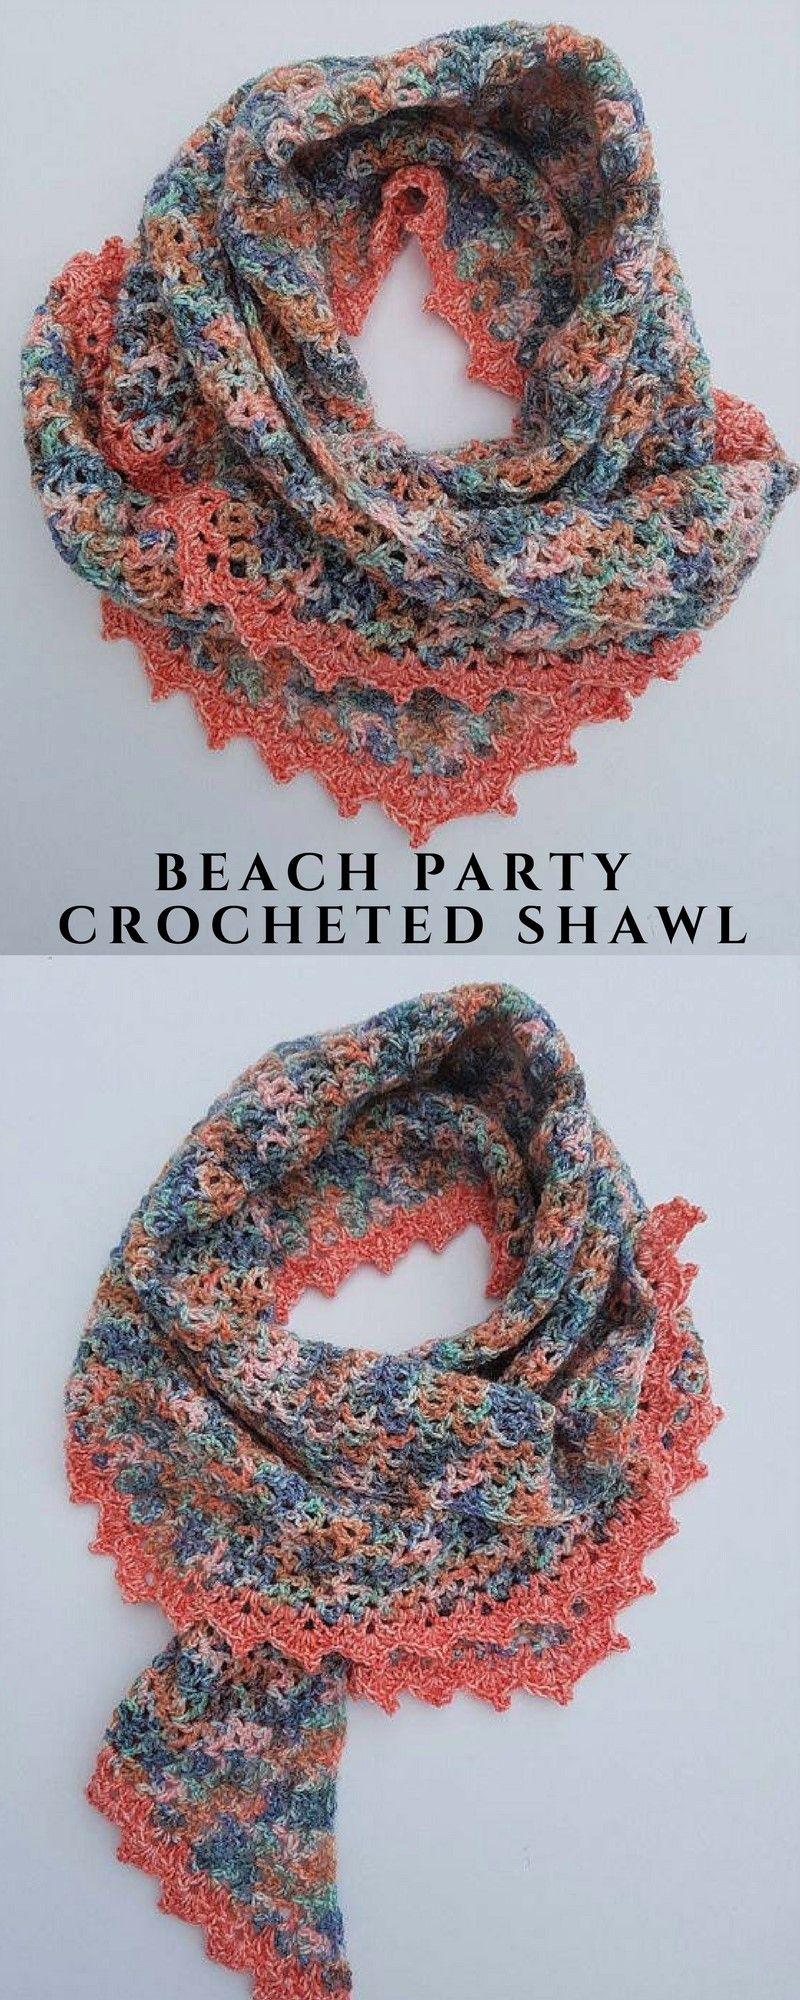 Beach Party - Easy Crochet Shawl Pattern #sponsored   Crochet Shawls ...